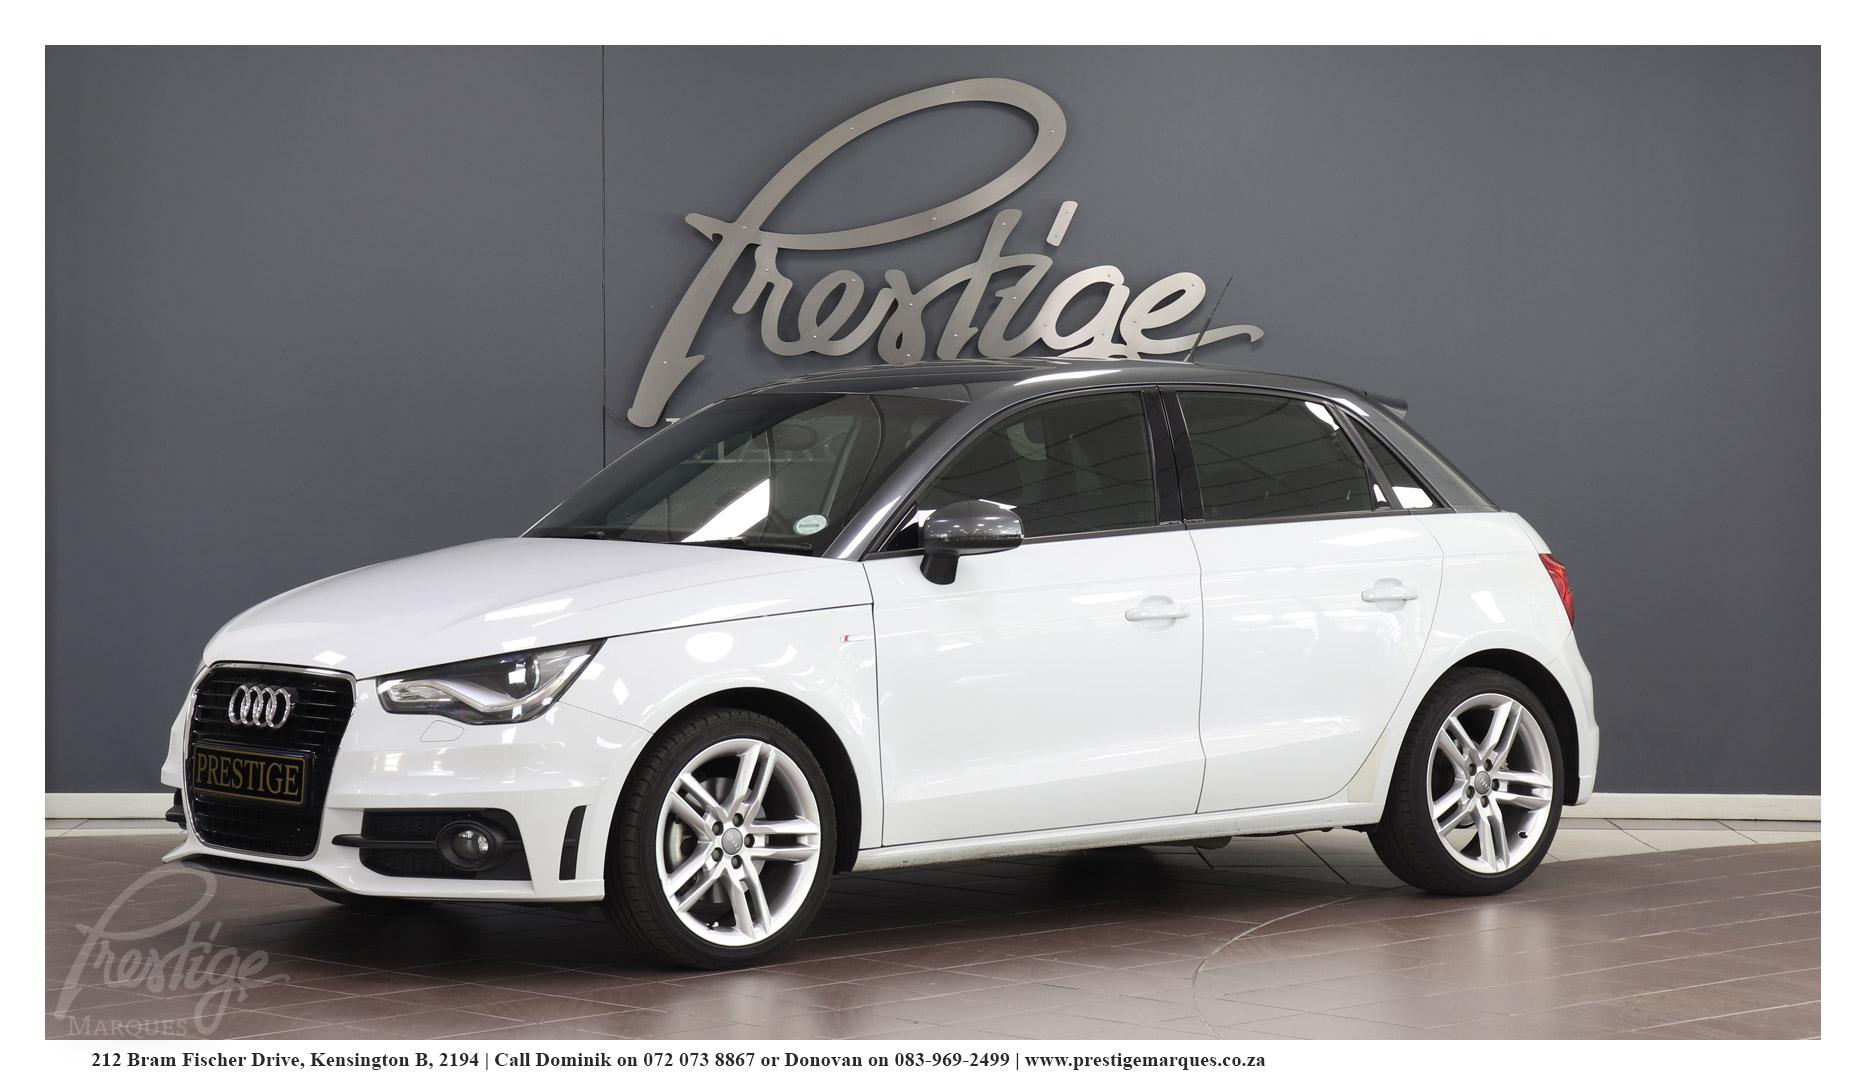 2012-Audi-A1-TFsi-STronic-Sline-Sportbackl-Prestige-Marques-Randburg-Sandton-8